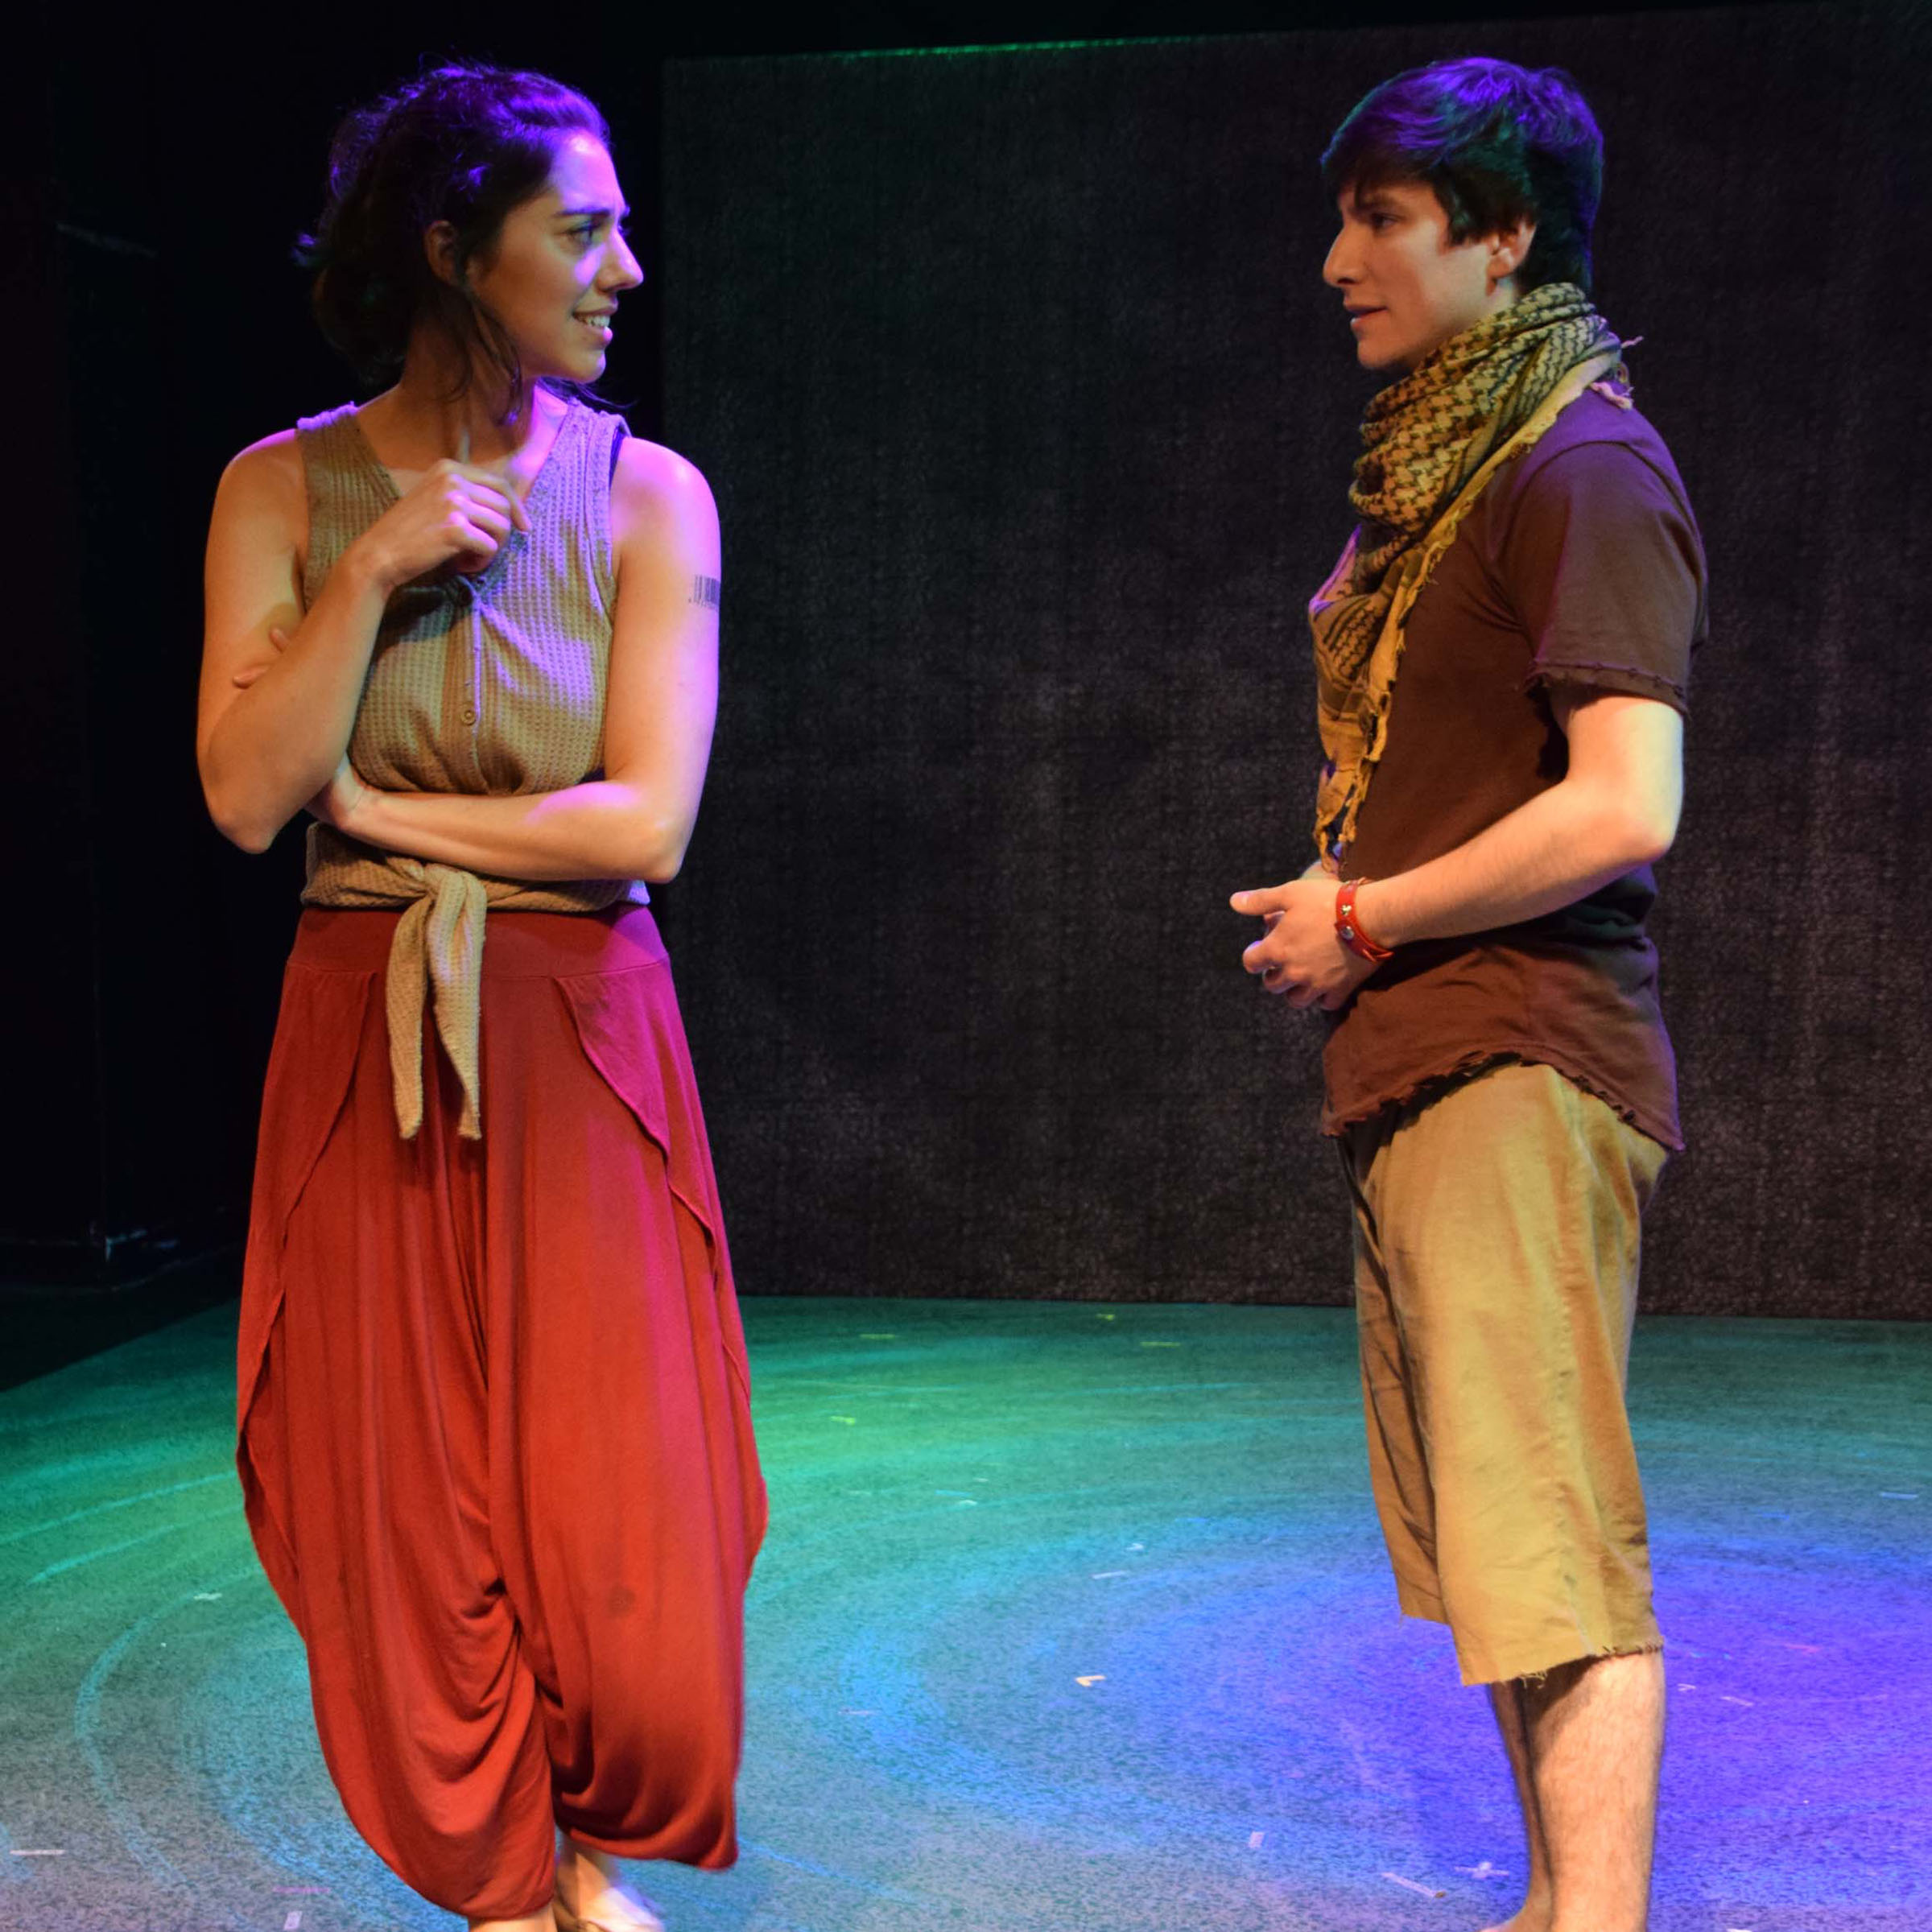 homeland 24 people's play piven theatre workshop alexandra plattos sulack